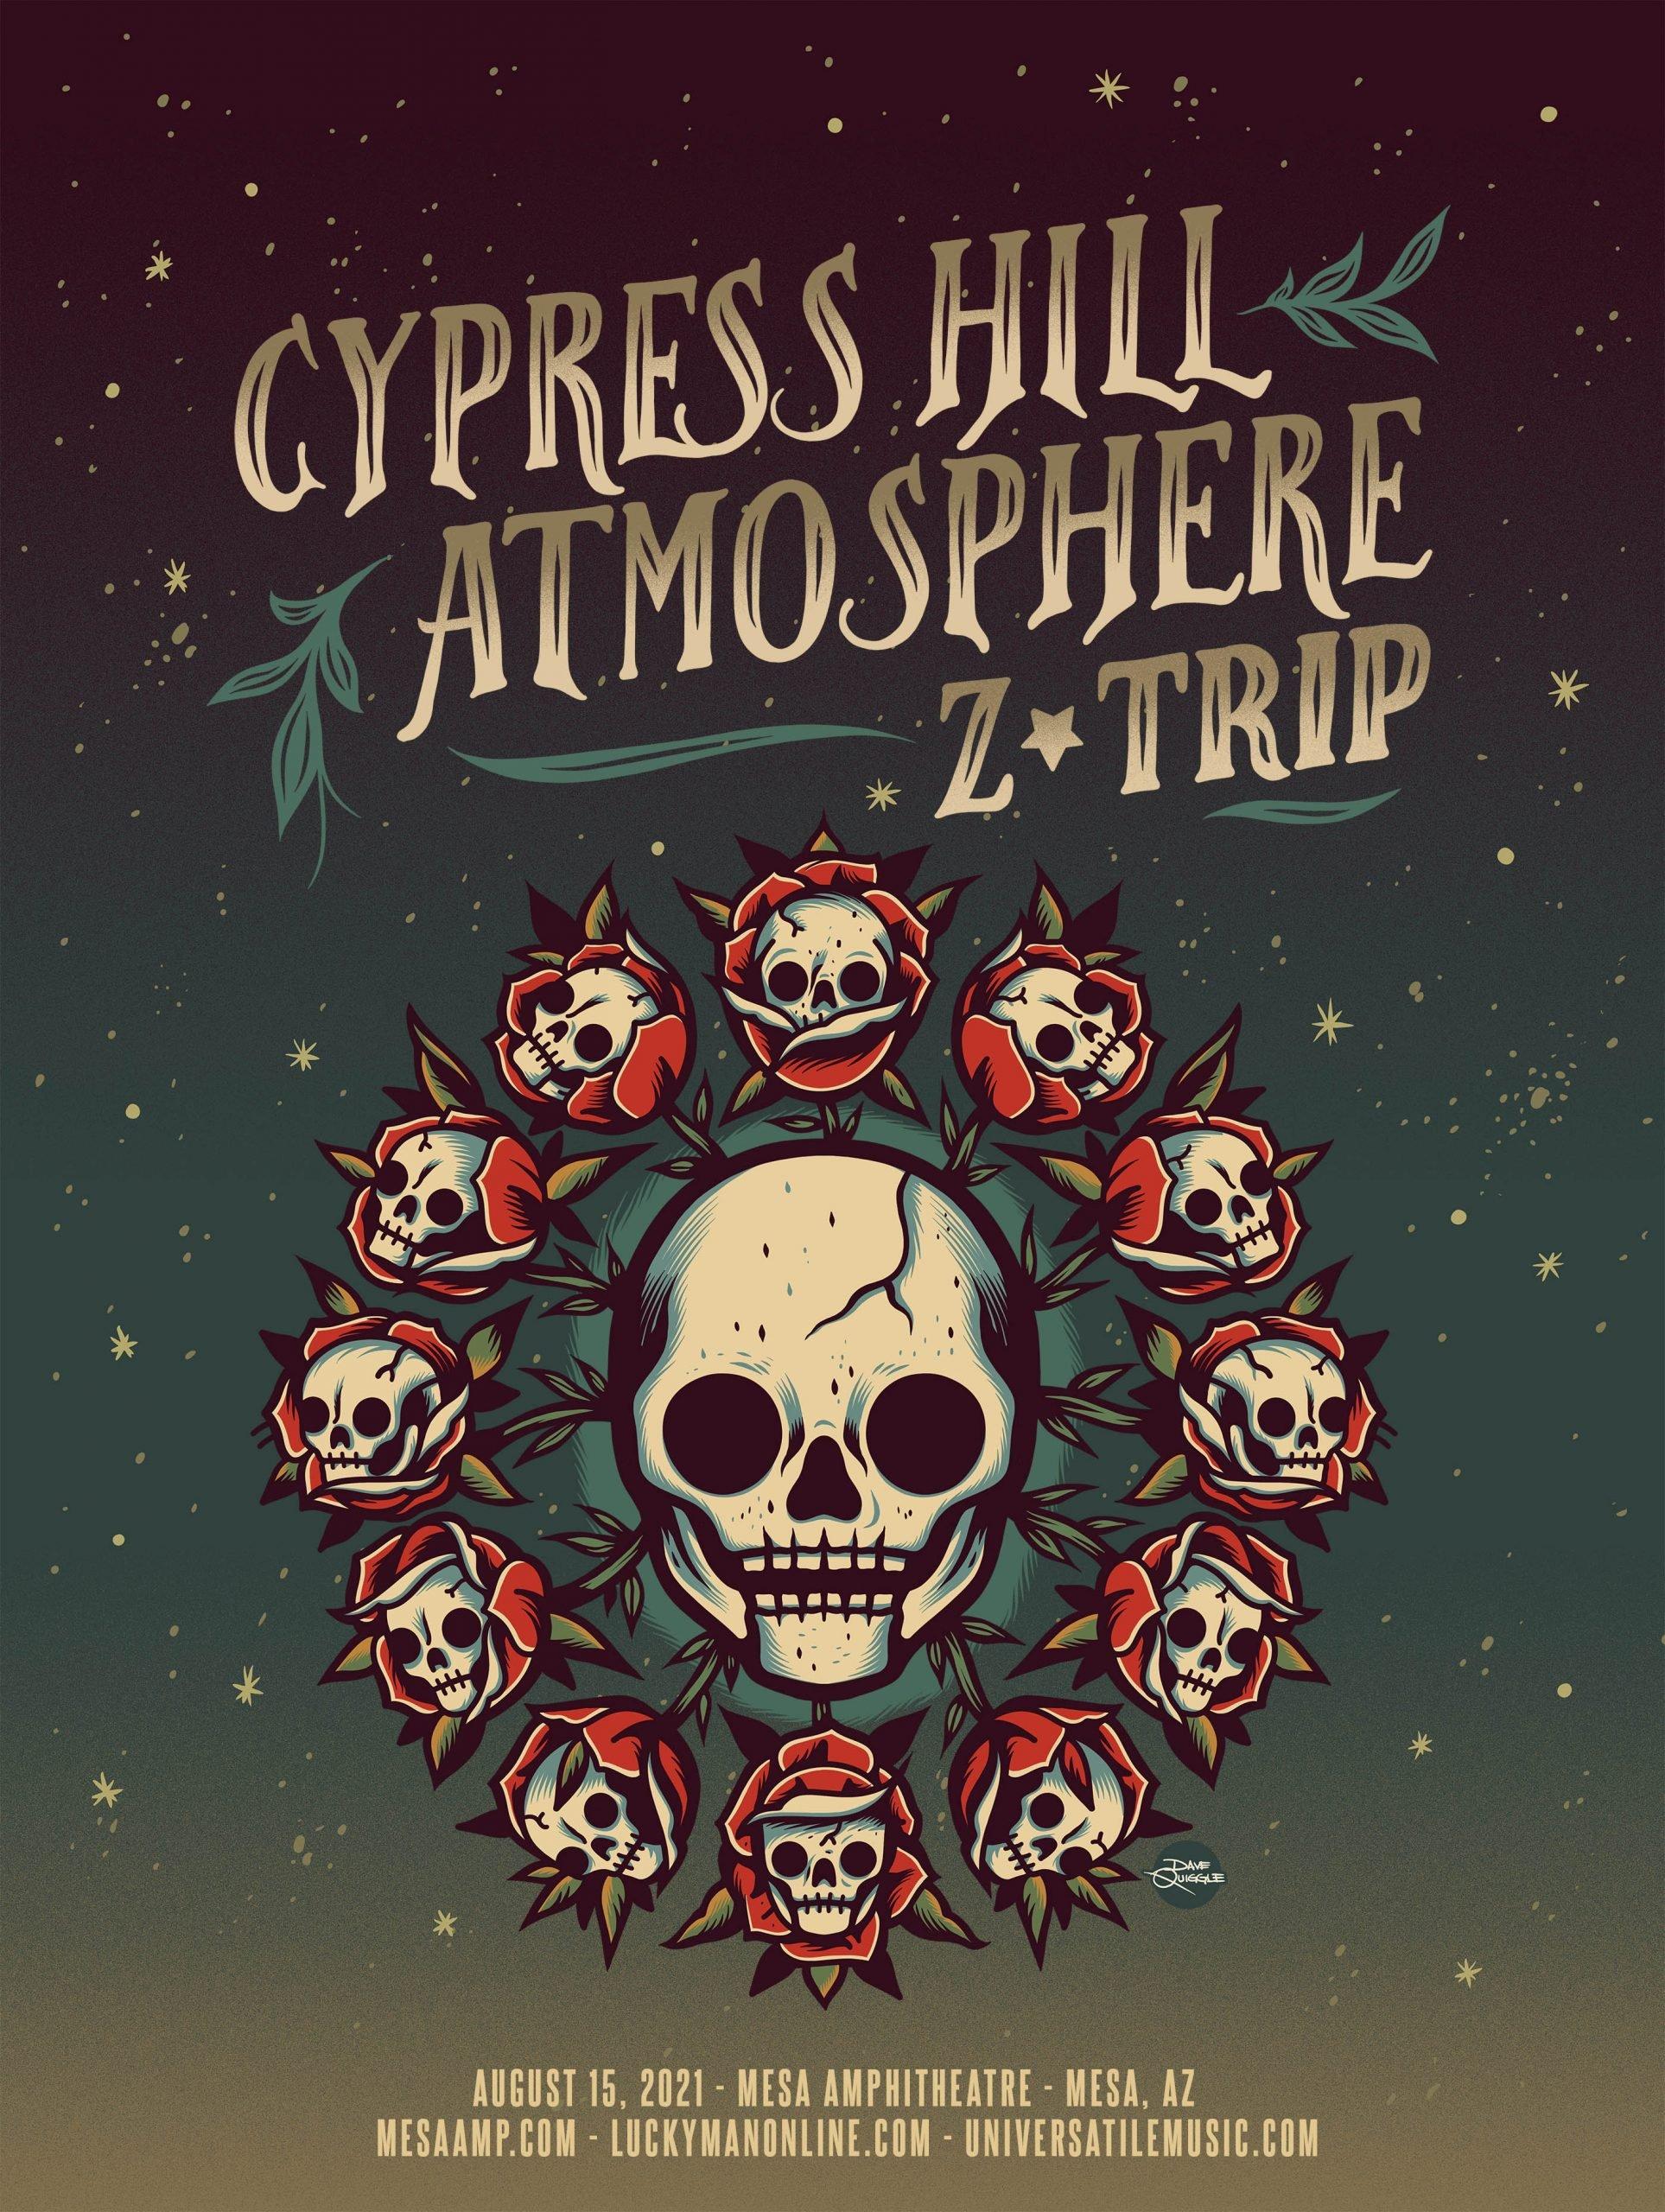 CypressHill_Atmosphere admat